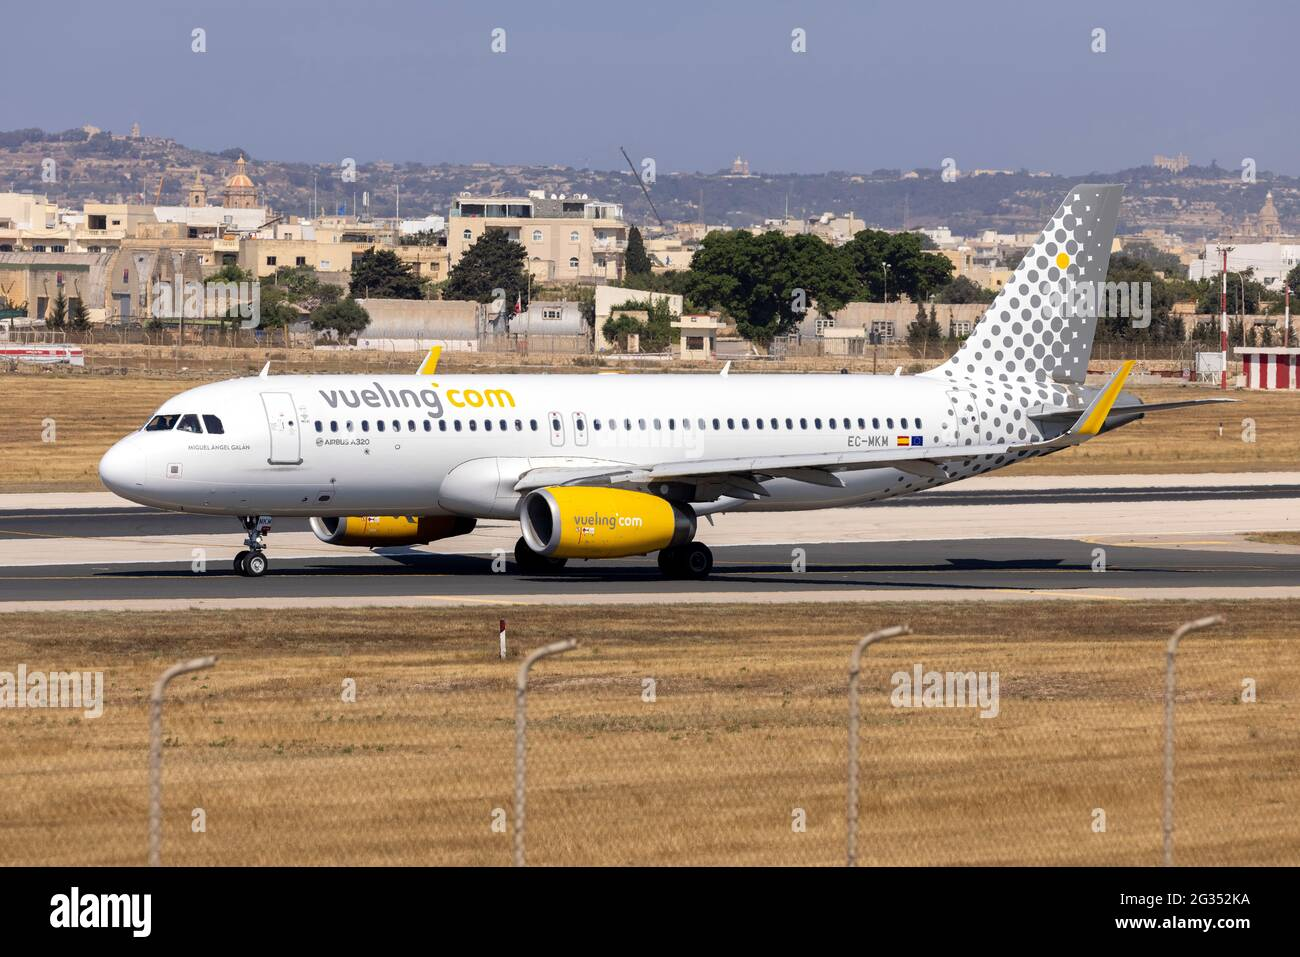 Vueling Airlines Airbus A320-232 (REG: EC-MKM) entrando en la pista 31 para despegue. Foto de stock